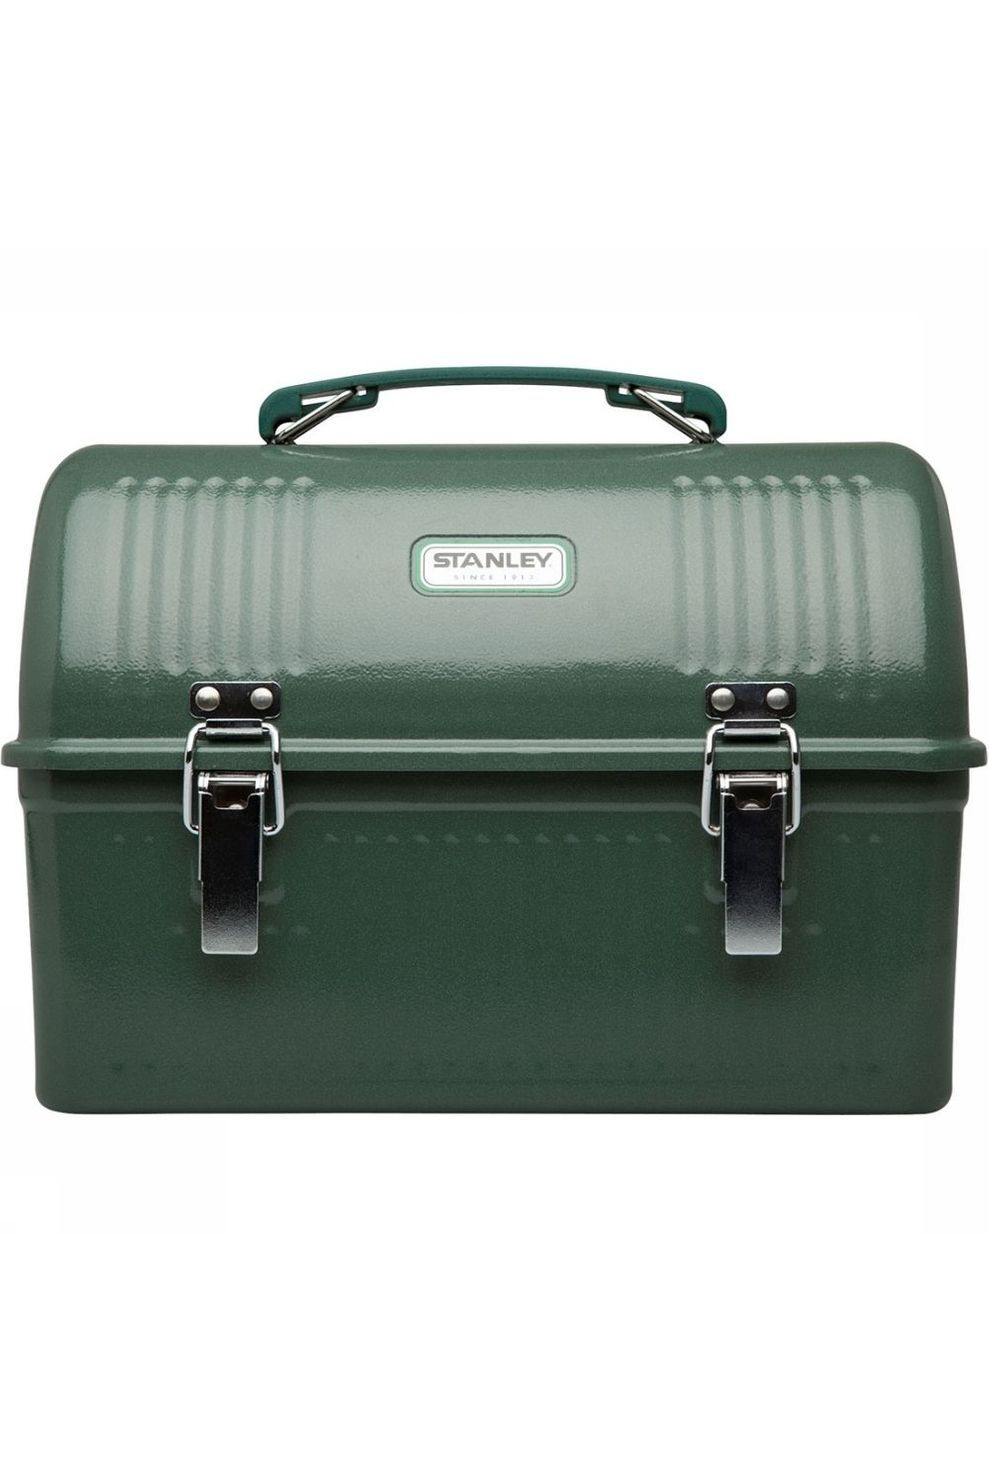 Stanley Classic Lunch Box 9,4L - Groen